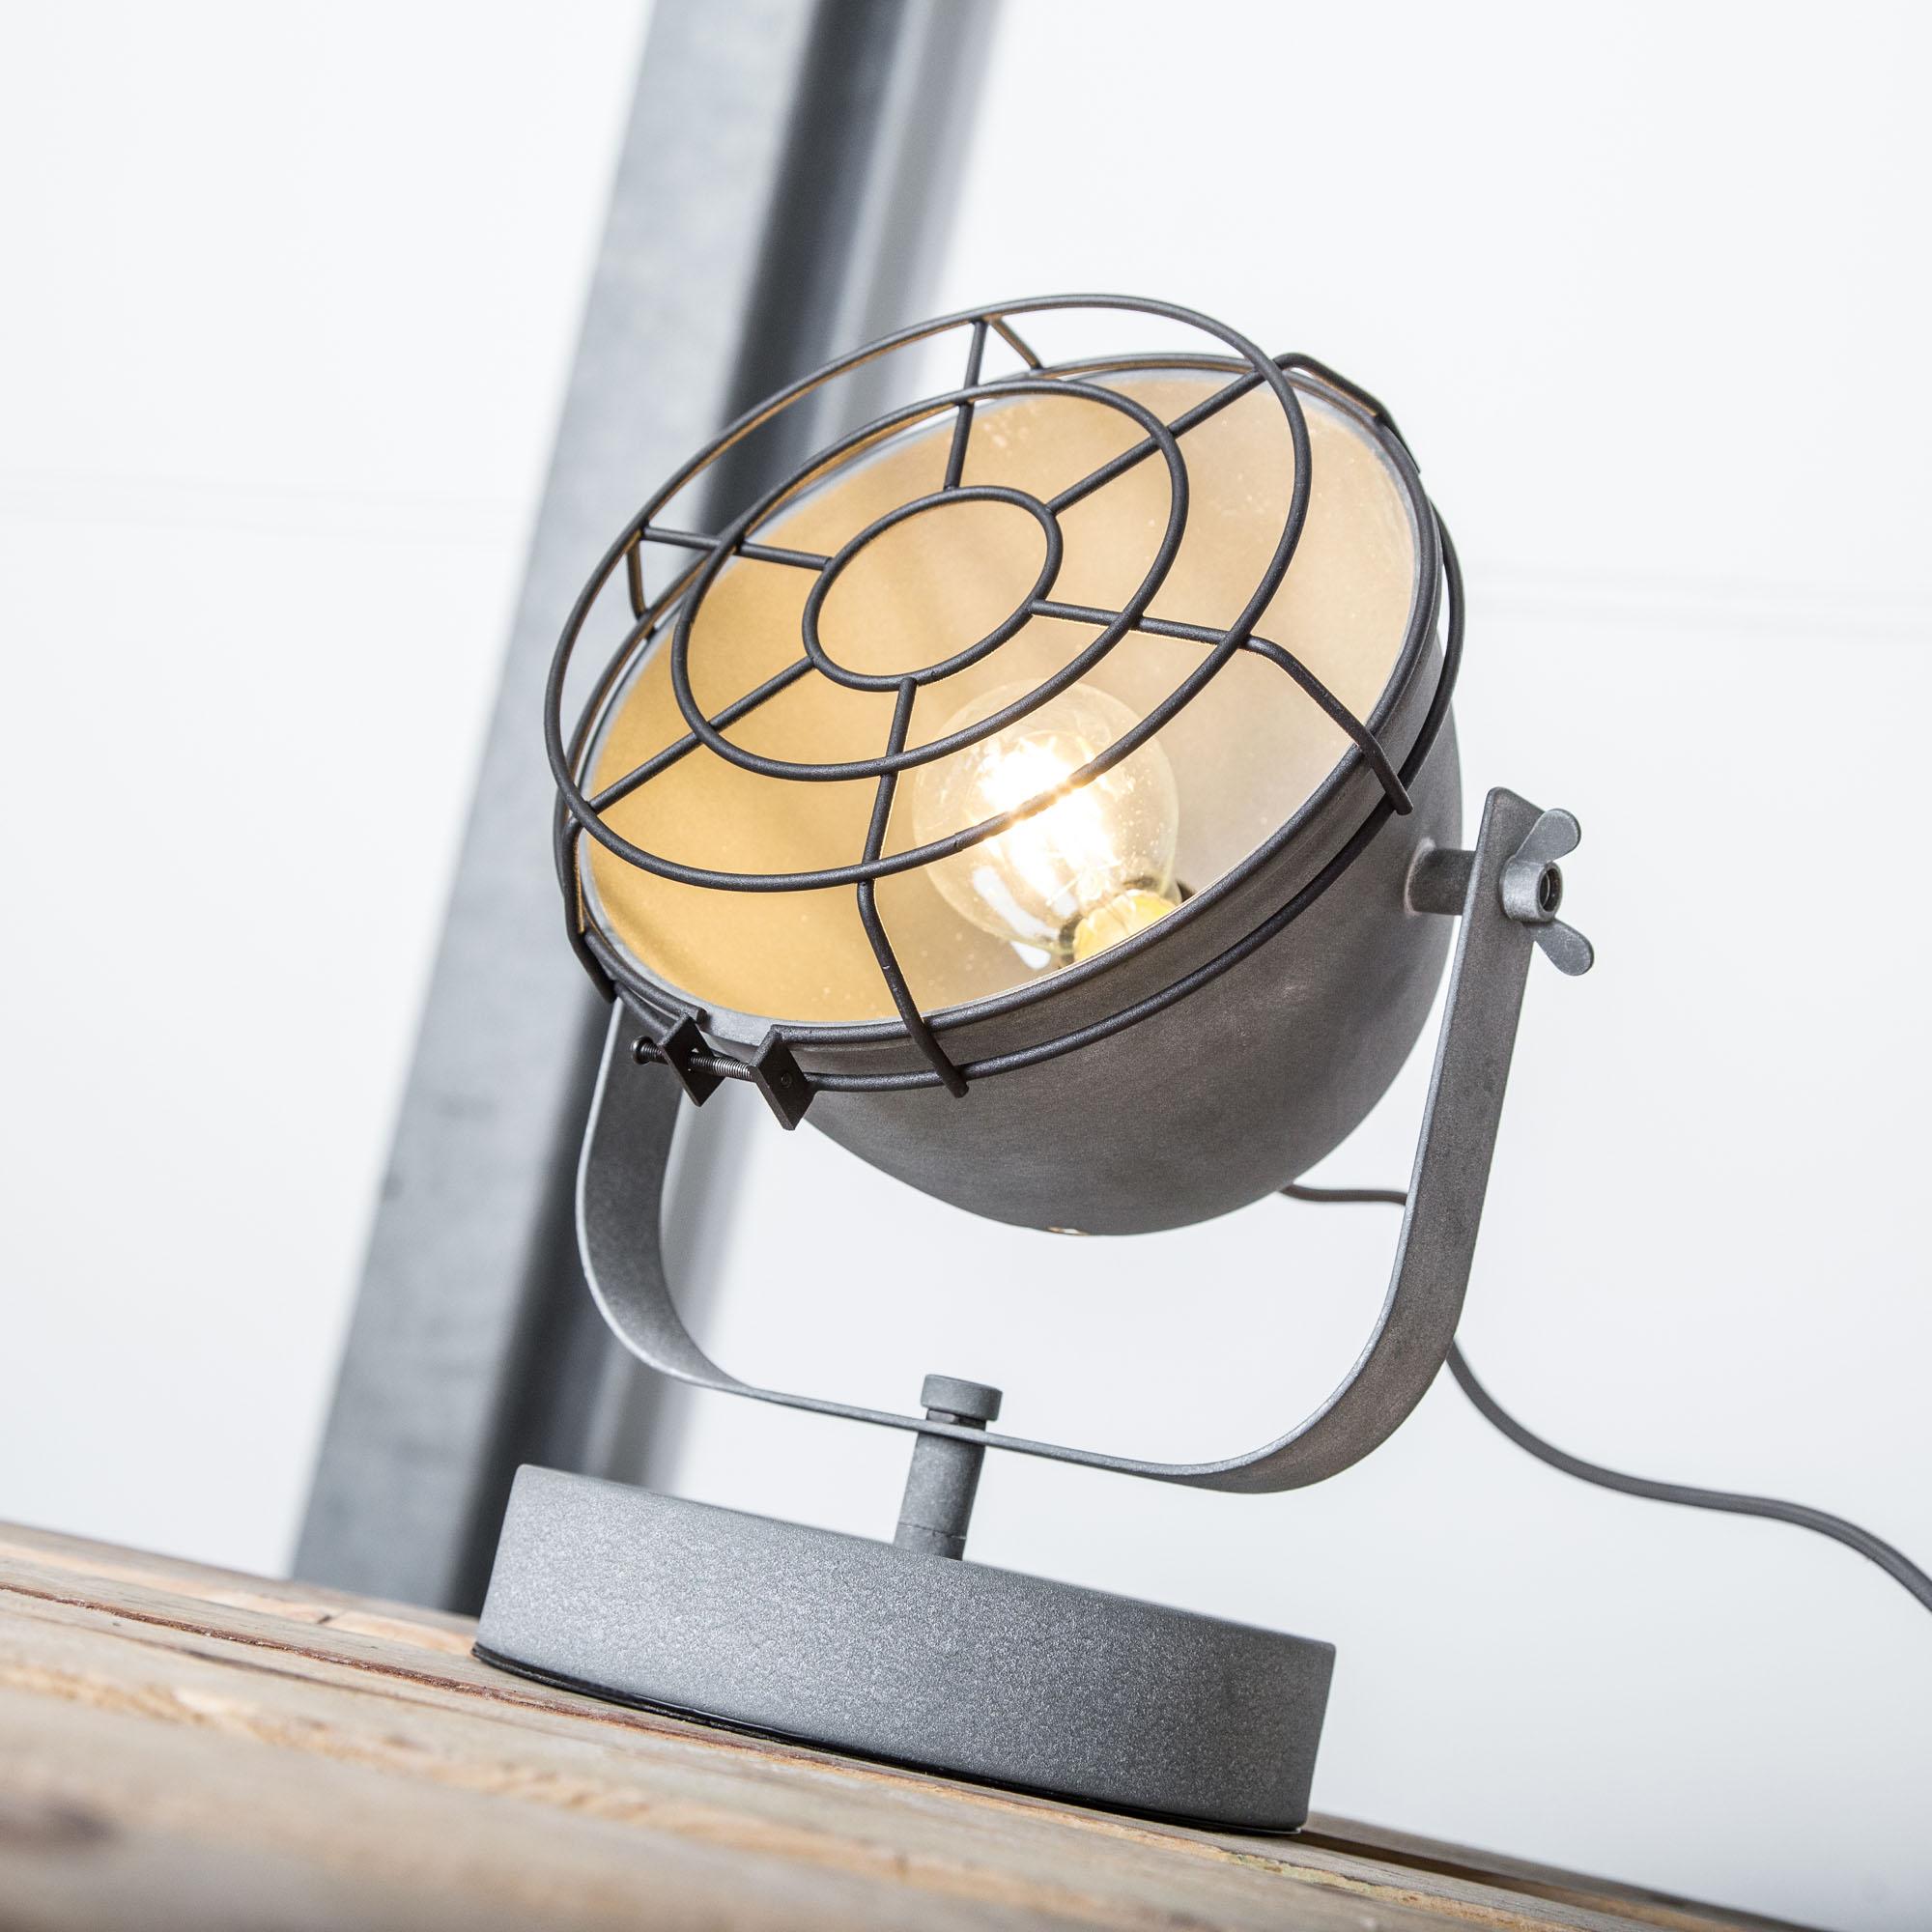 vintage tischleuchte im industrial used look 1x e27 max 40w metall grau beton lightbox. Black Bedroom Furniture Sets. Home Design Ideas